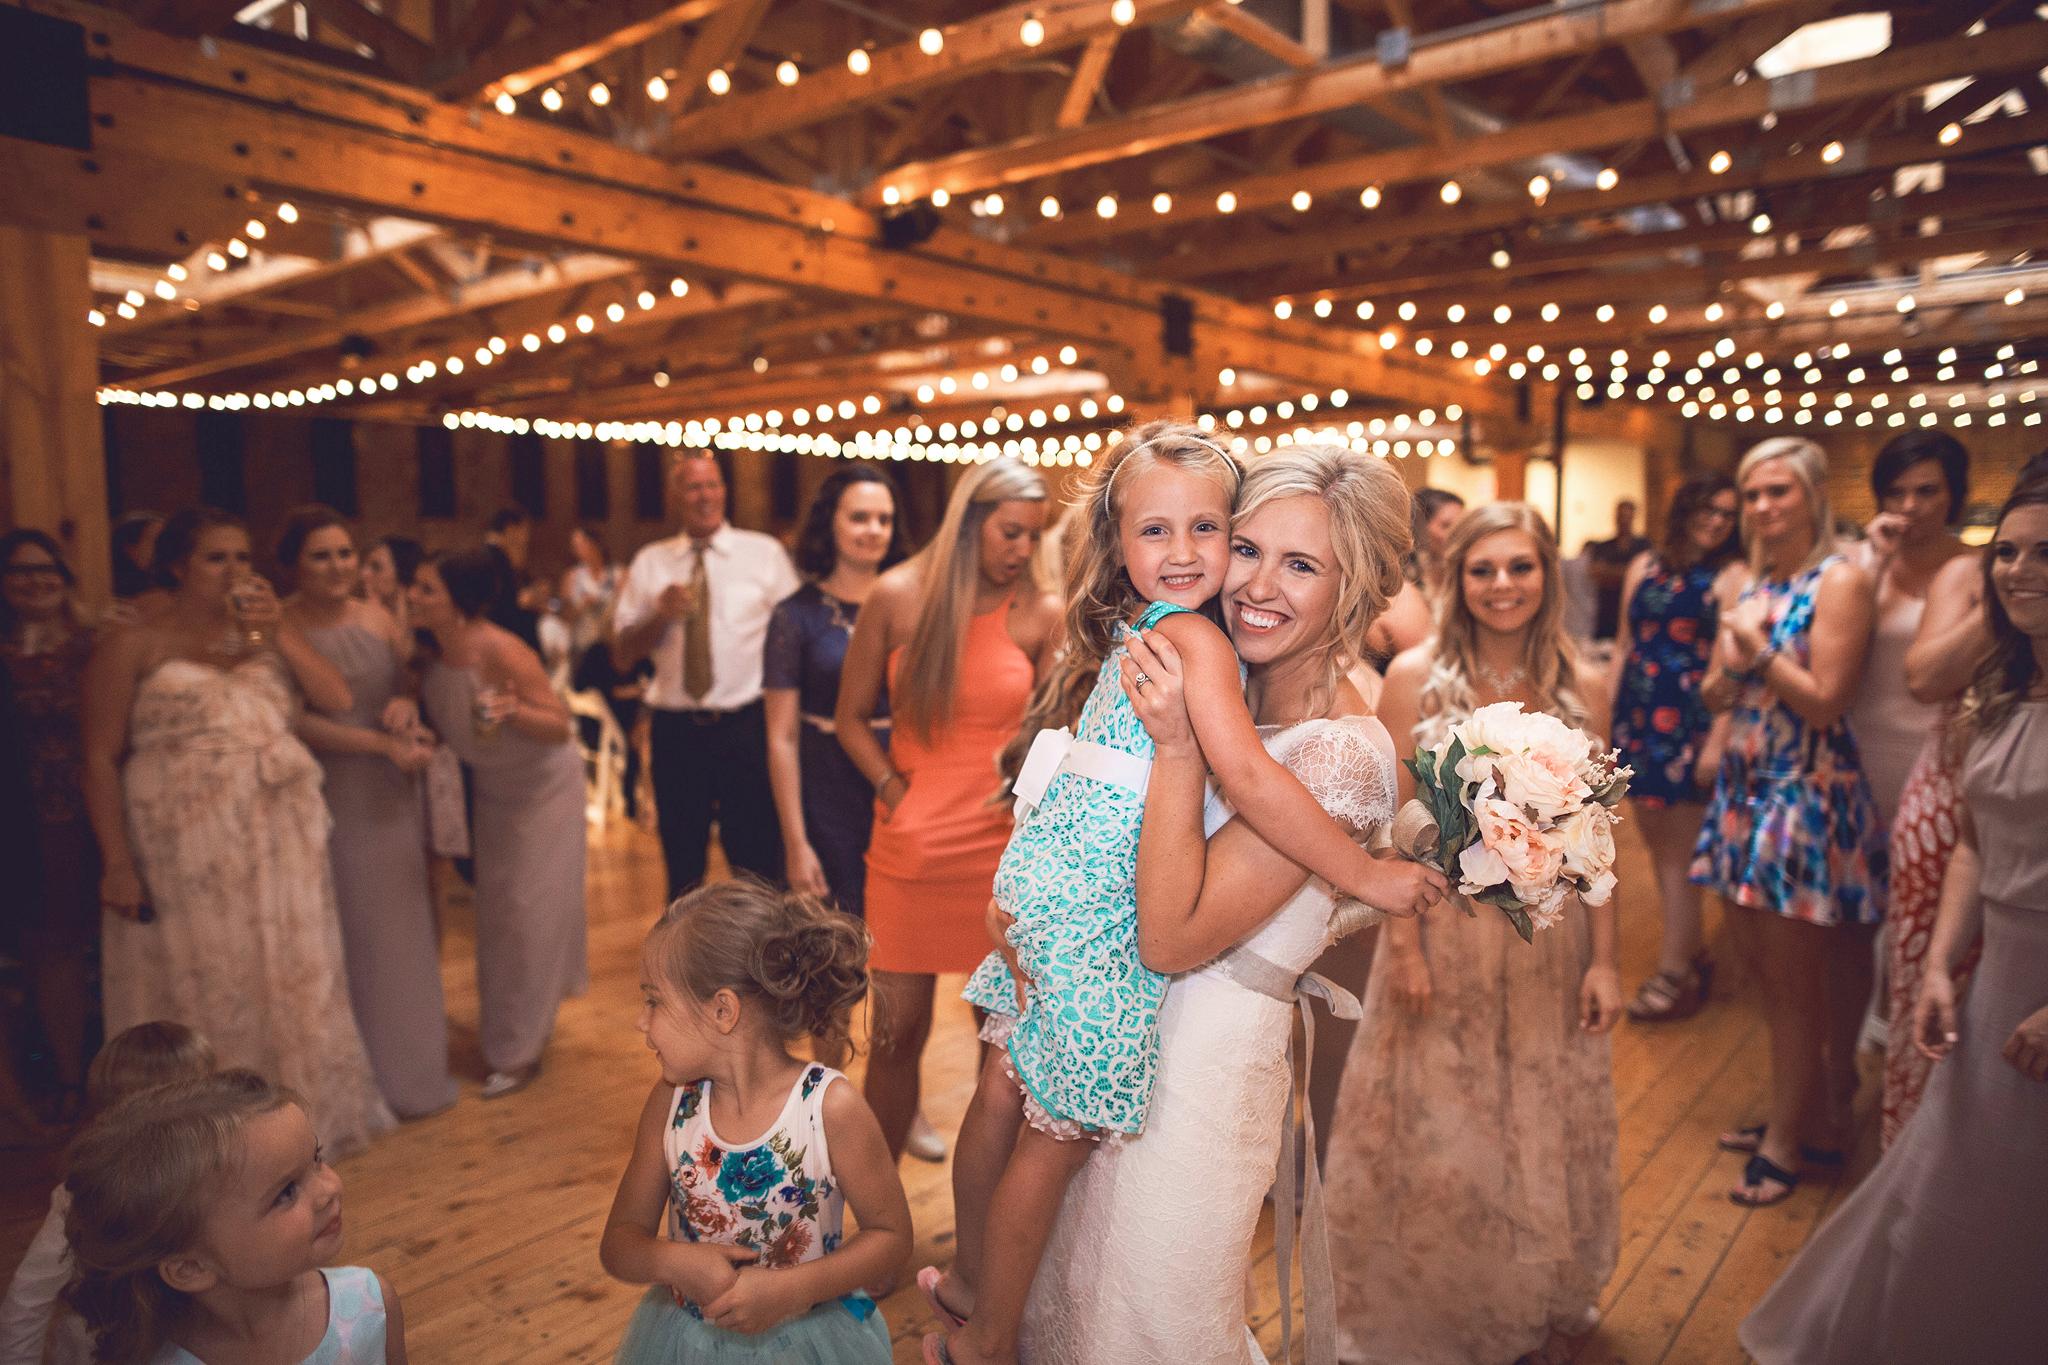 Cincinnati-Dayton-OH-Traveling-Wedding-Photographer-Rhinegeist-Brewery-Ault-Park-21C-159.jpg